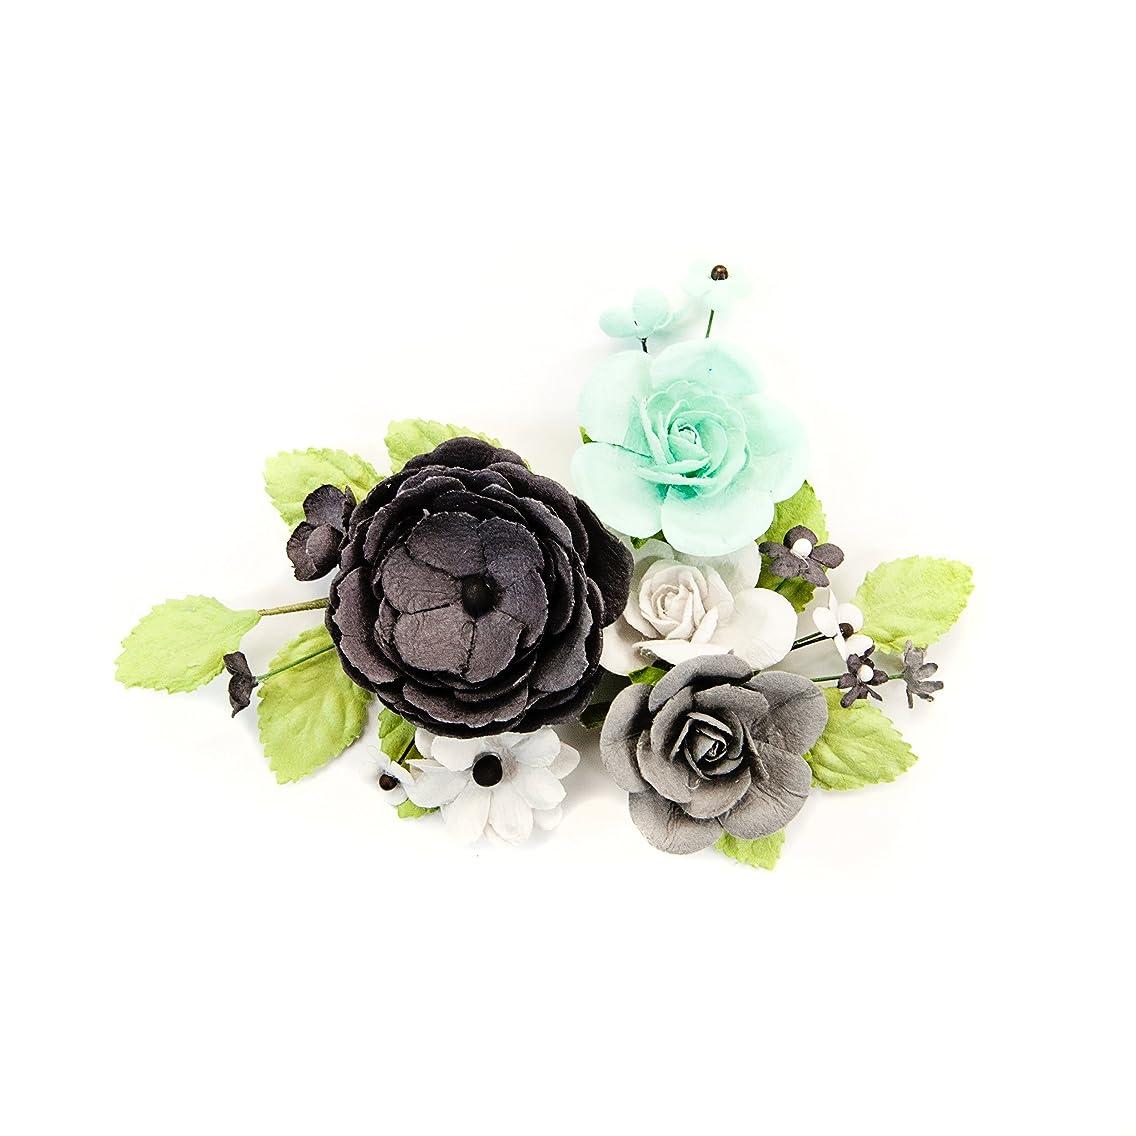 Prima Marketing Inc. 634537 Flirty Fleur Flowers, Multicolored